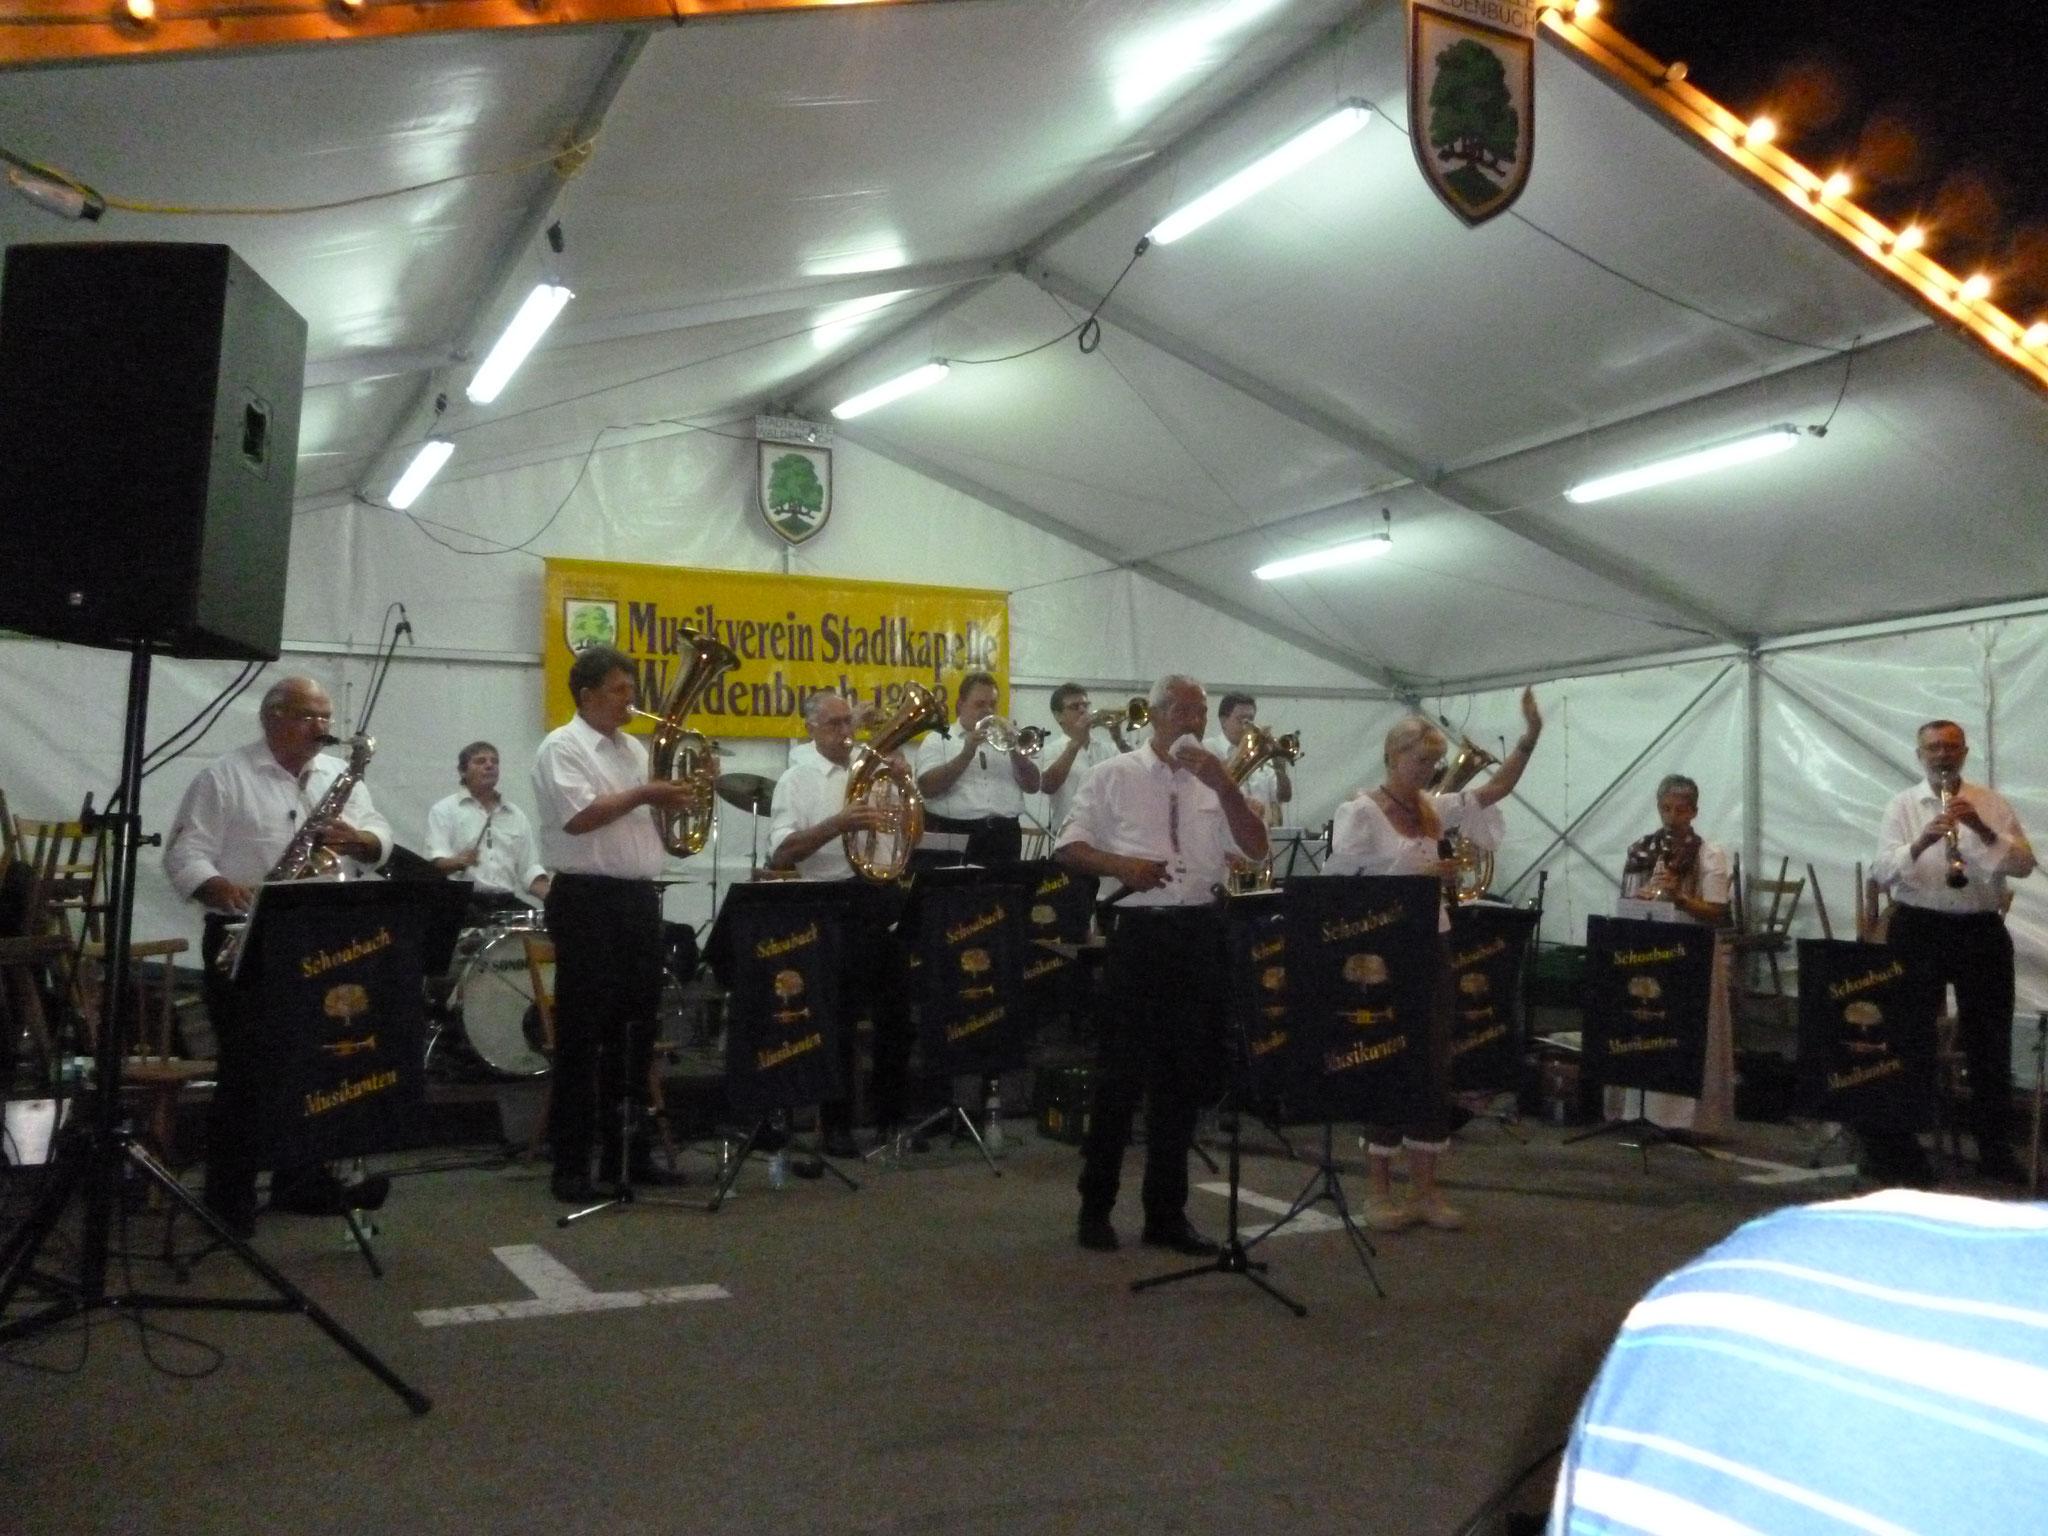 MV Waldenbuch Marktplatzfest 09.09.2012